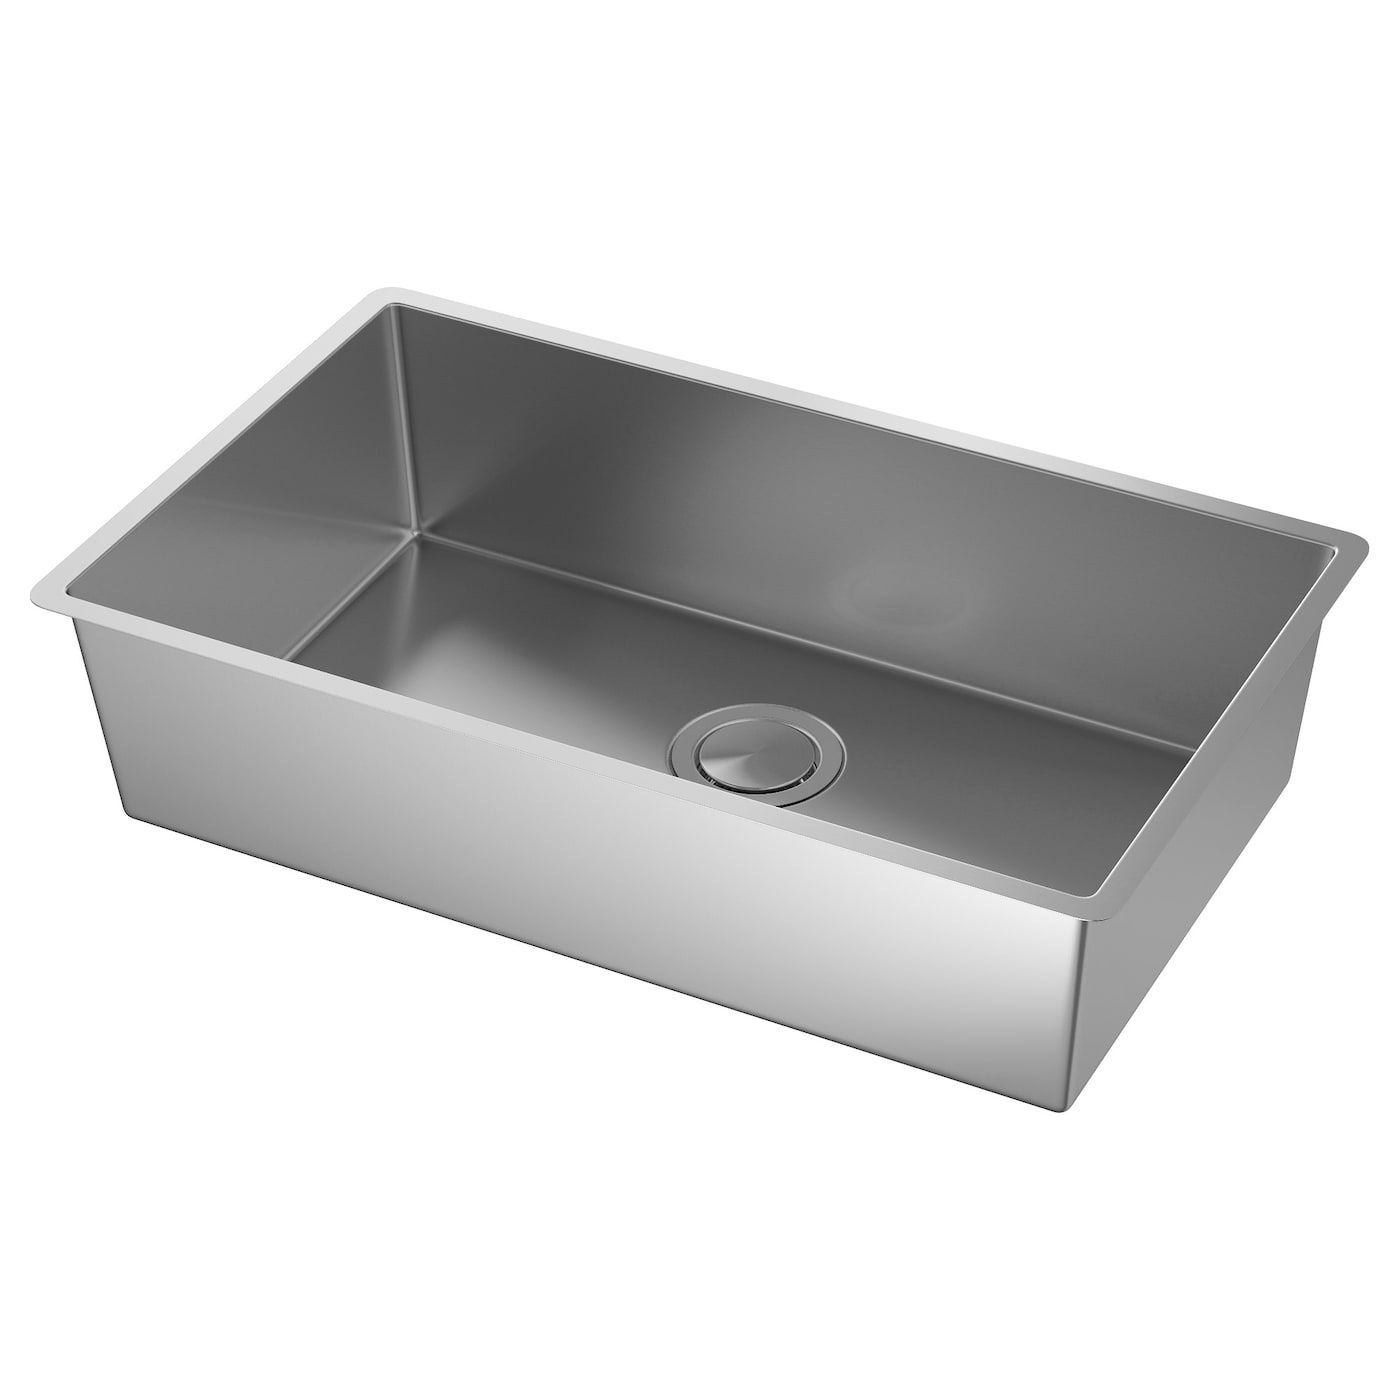 Norrsjon Sink Stainless Steel 29x17 3 8 Sink Inset Sink Stainless Steel Sinks